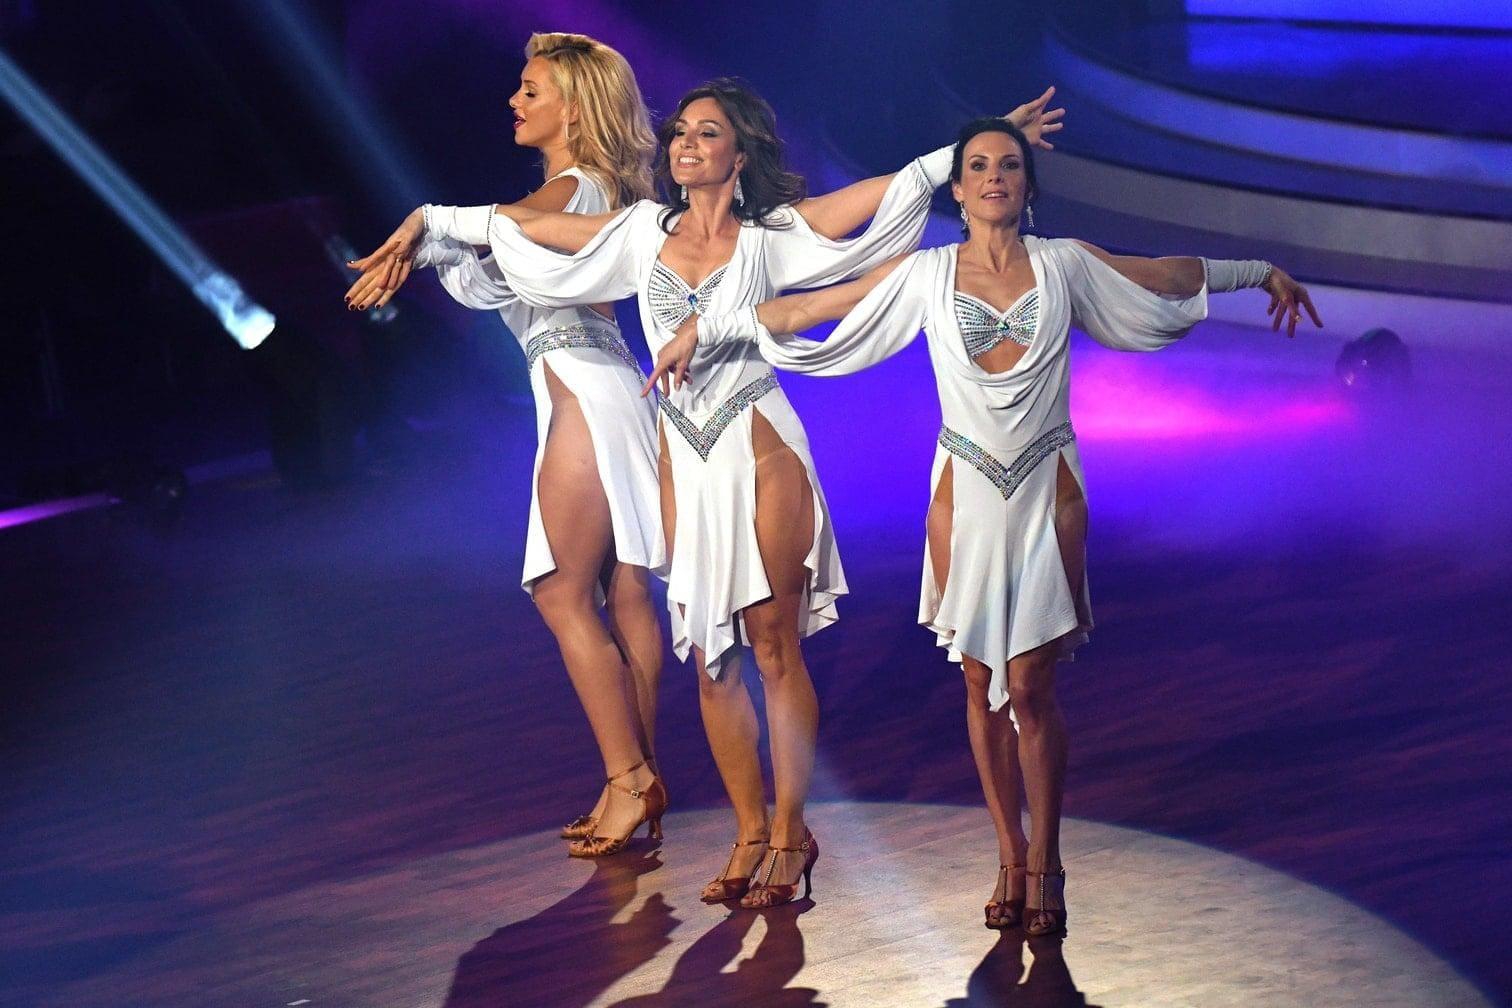 Evelyn Burdecki Nazan Eckes Sabrina Mockenhaupt Let's Dance 2019